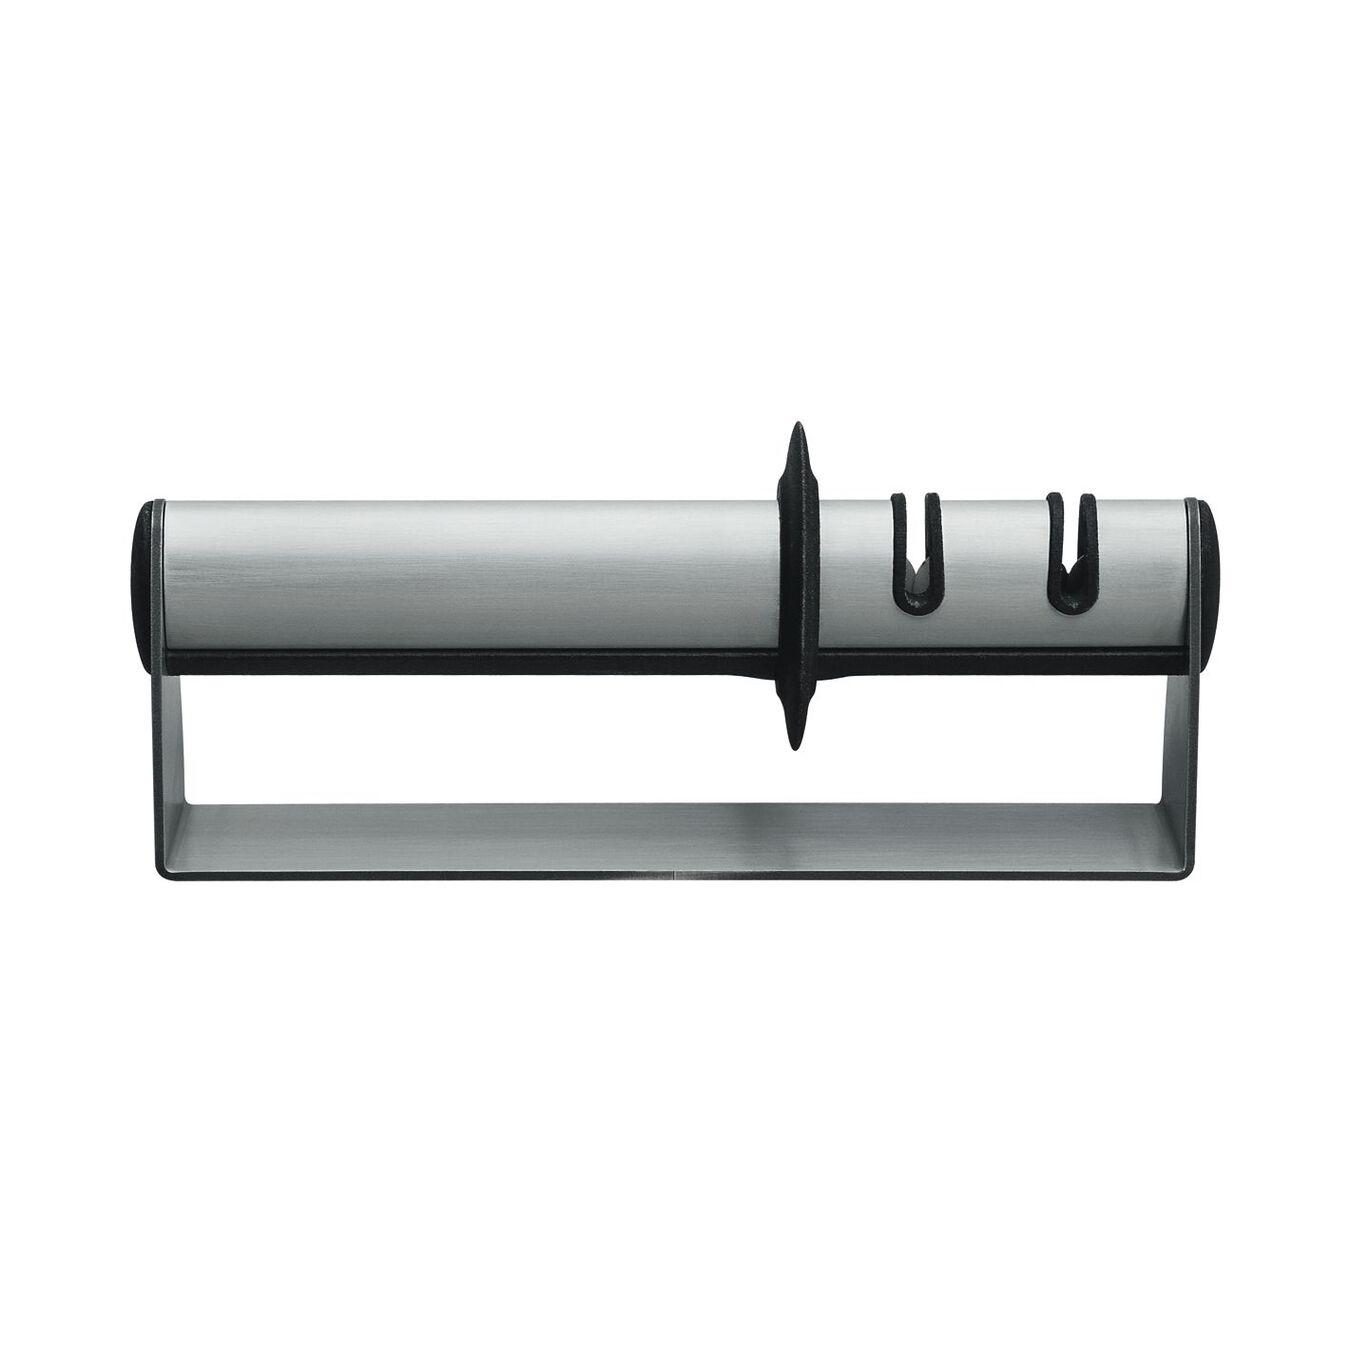 TWINSHARP Select Silber,,large 1